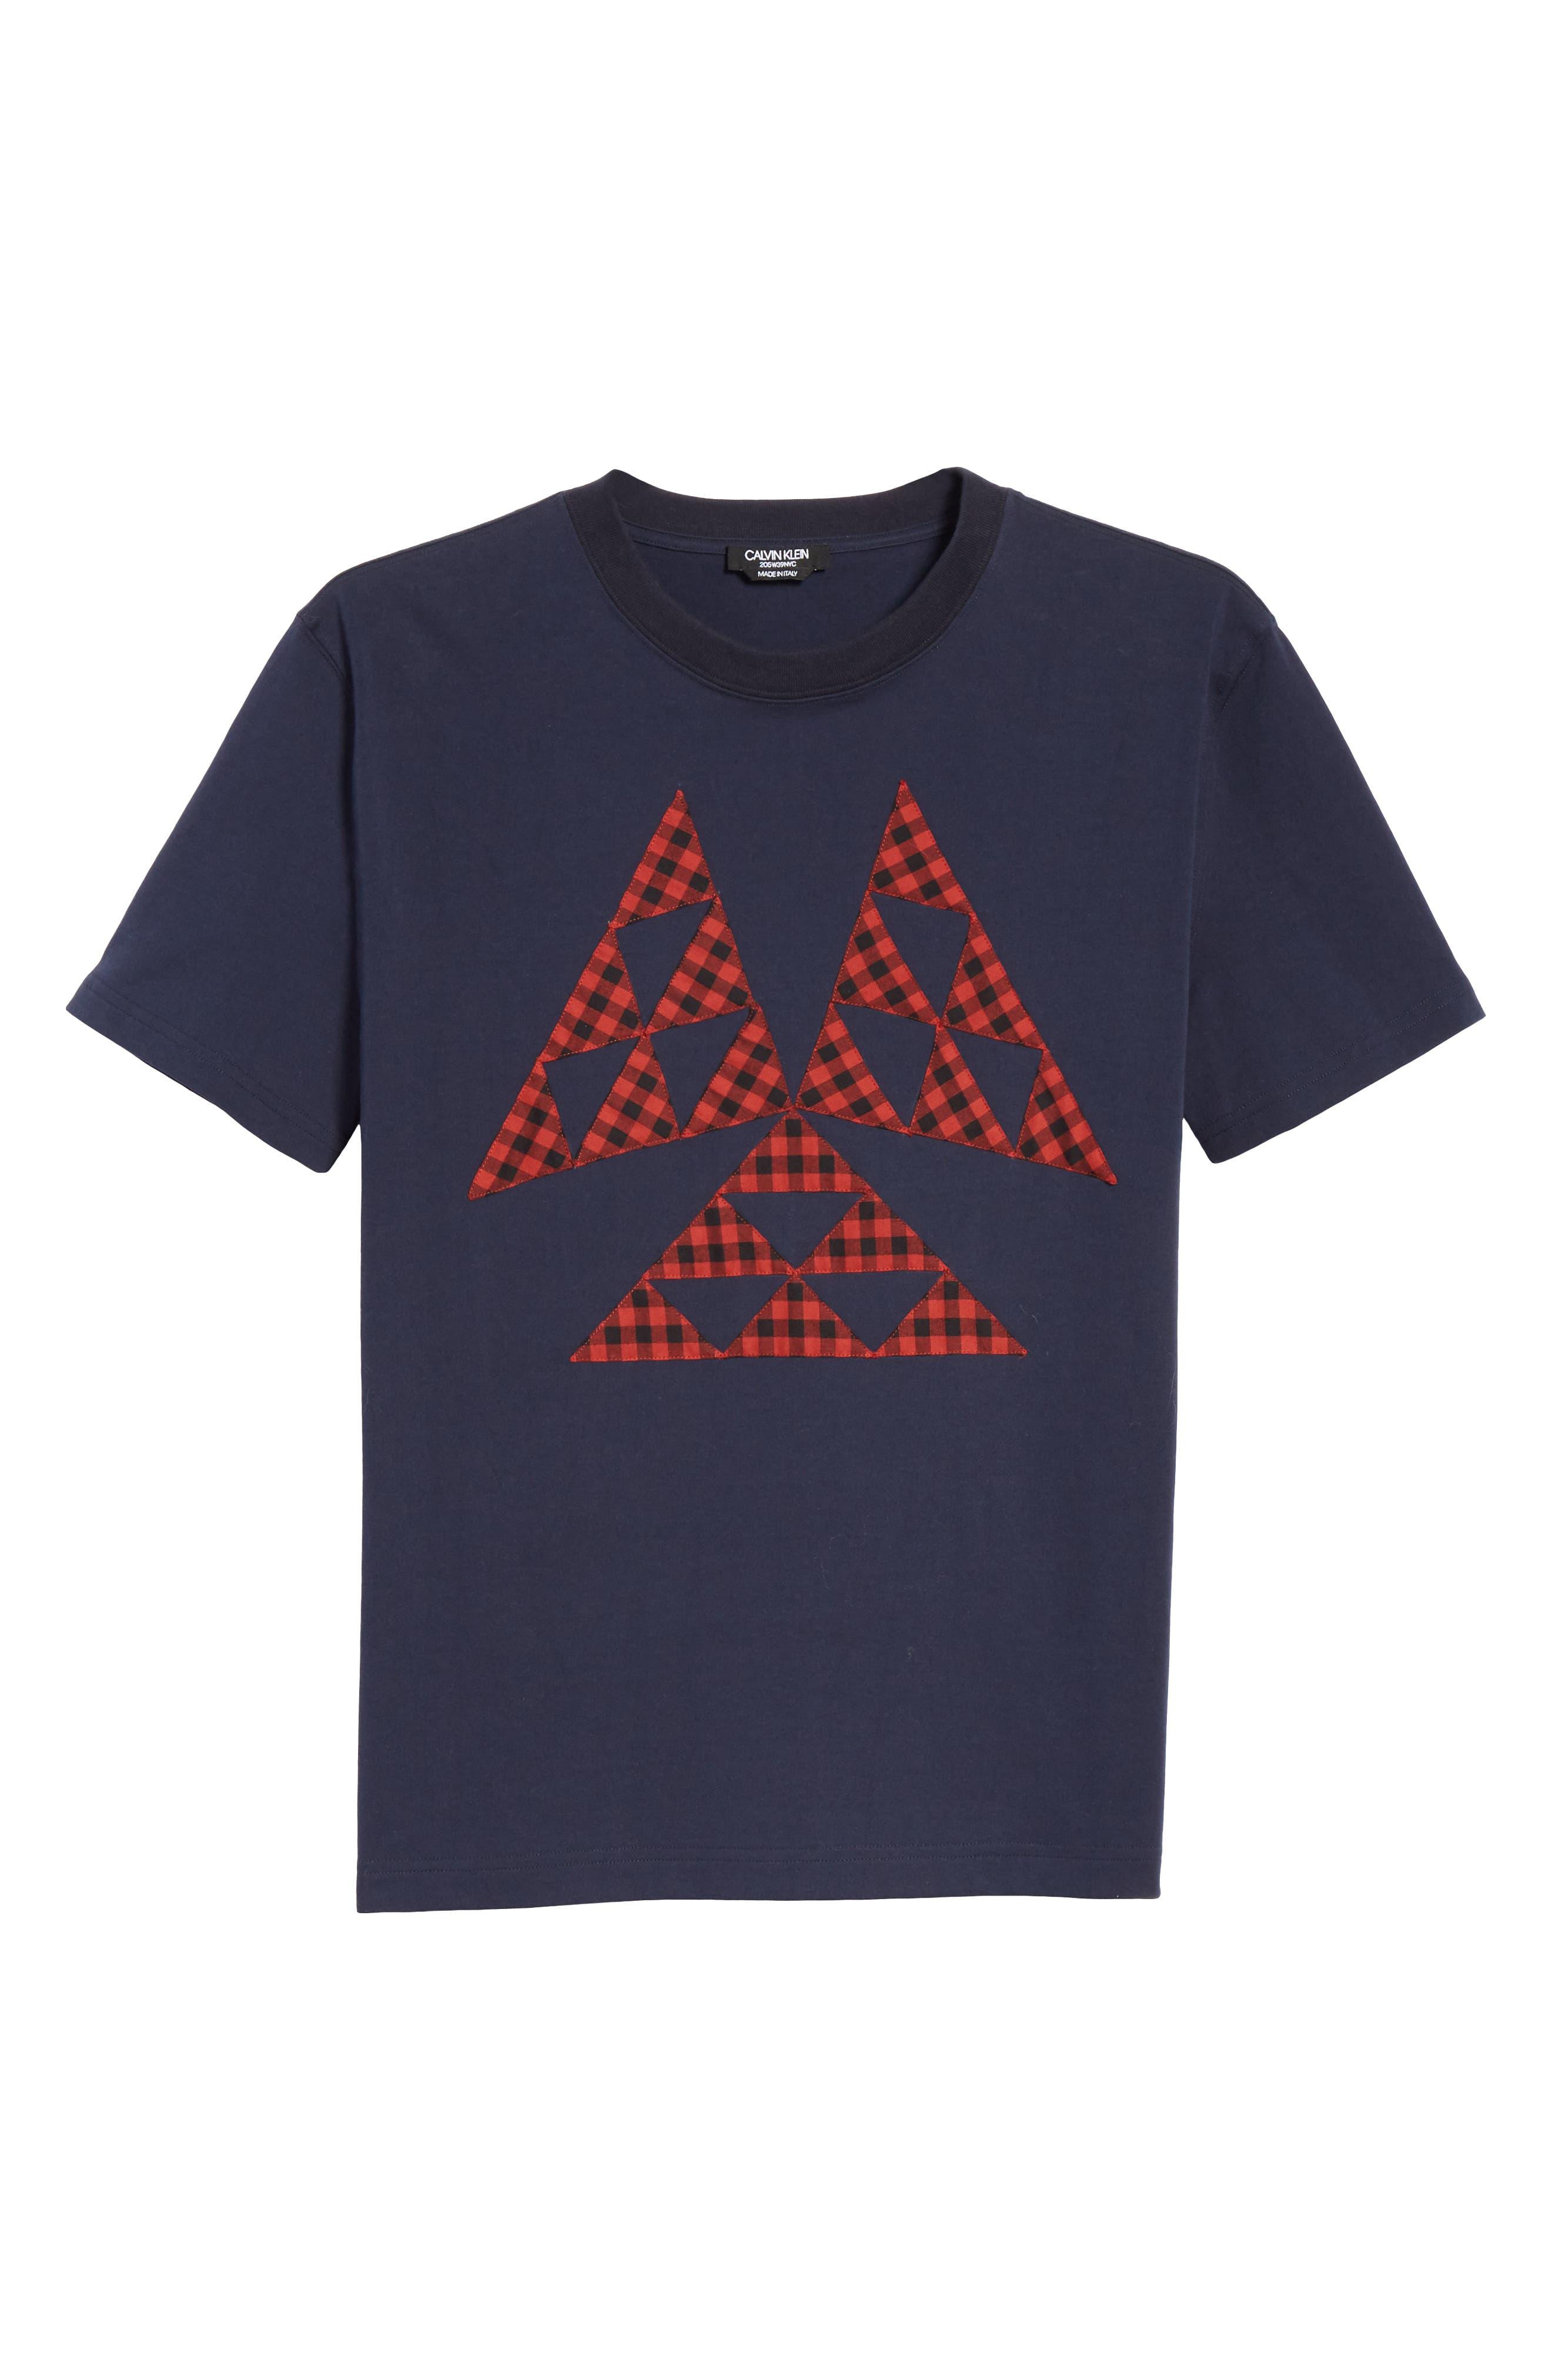 Patchwork T-Shirt,                             Alternate thumbnail 6, color,                             NAVY